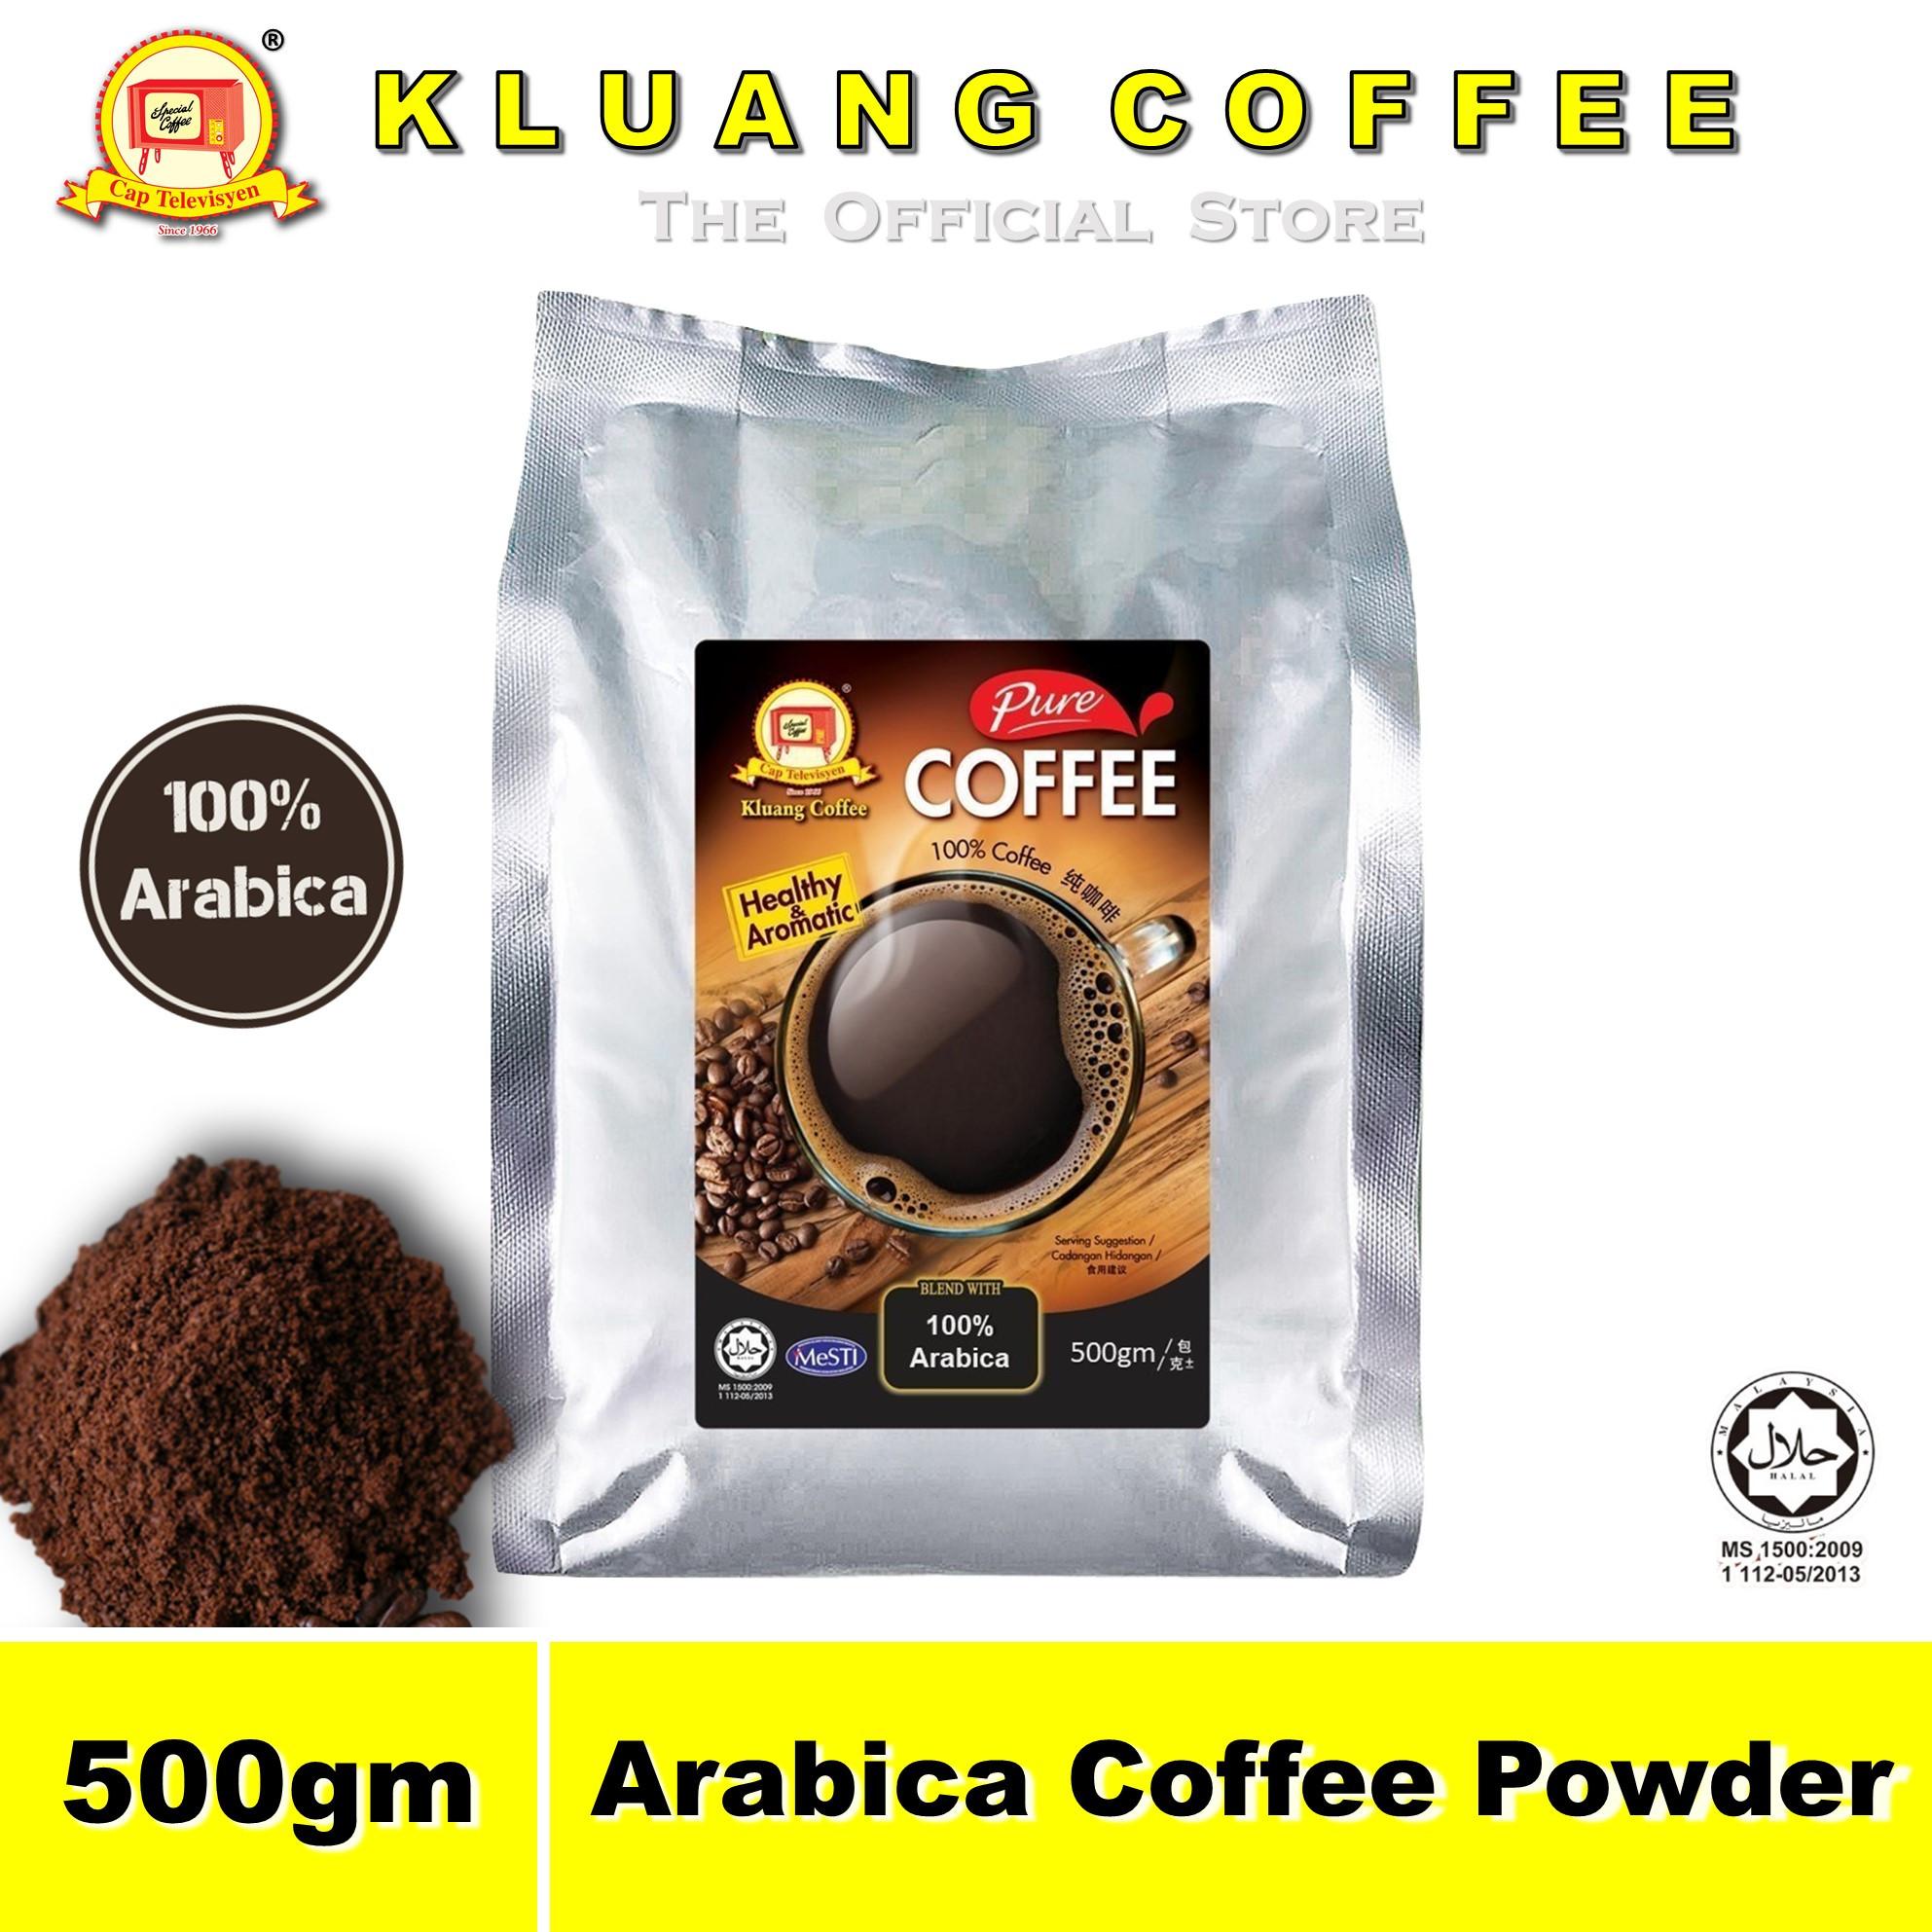 Kluang 100% Arabica Pure Coffee Powder【500gm】CAP TELEVISYEN